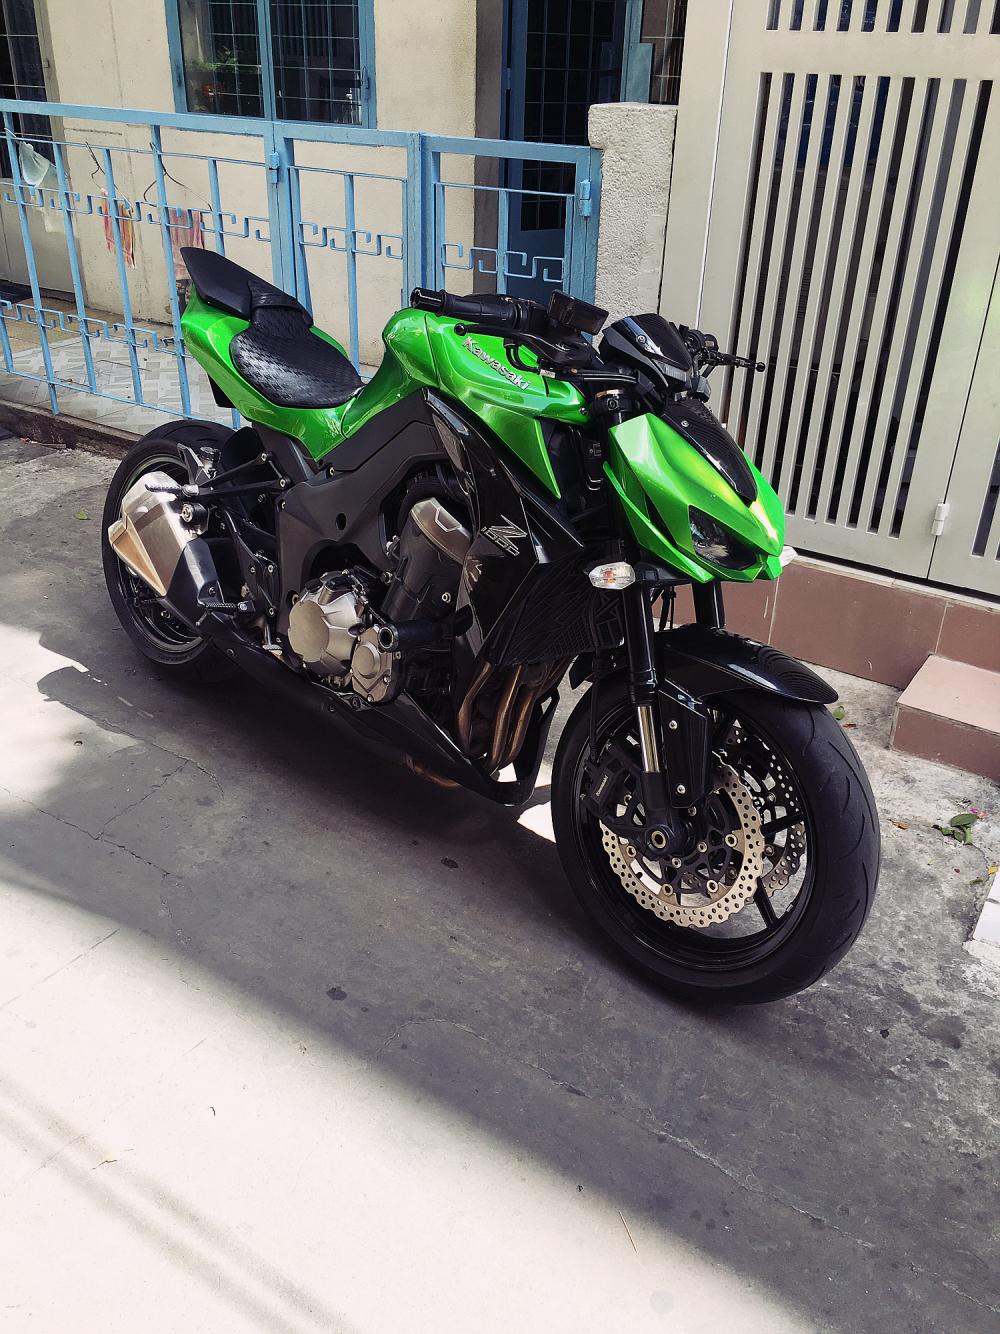 Kawasaki Z1000 Chau au cuoi 2015